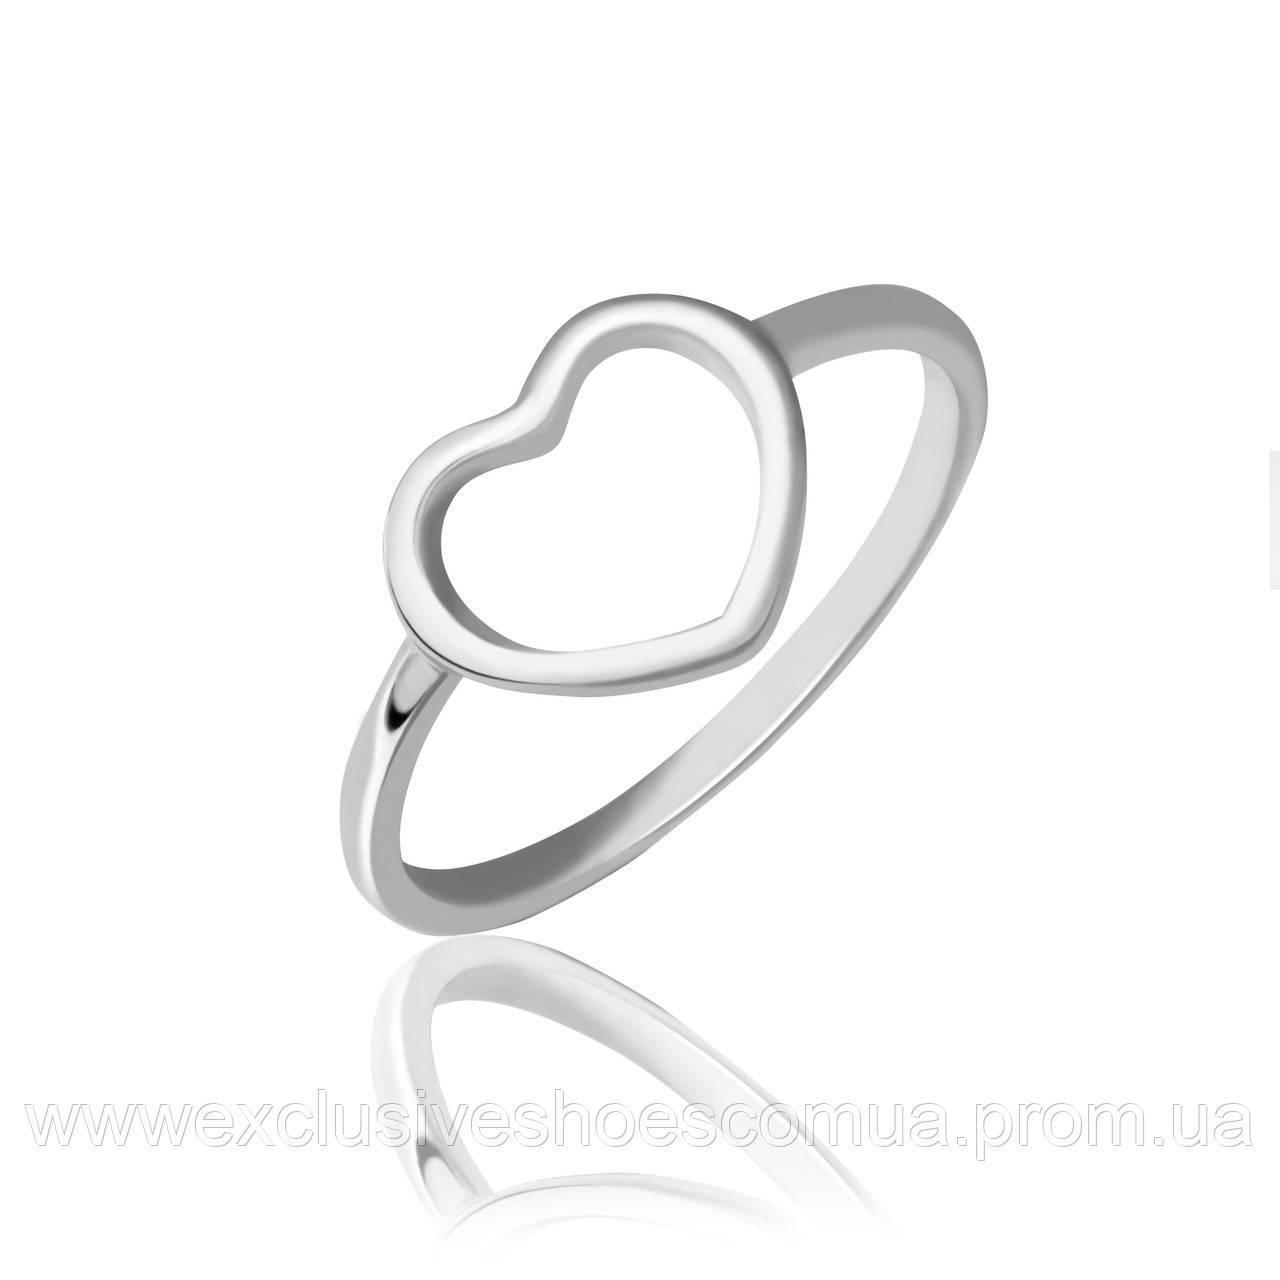 Серебряное кольцо с декоративным сердцем, арт-910035